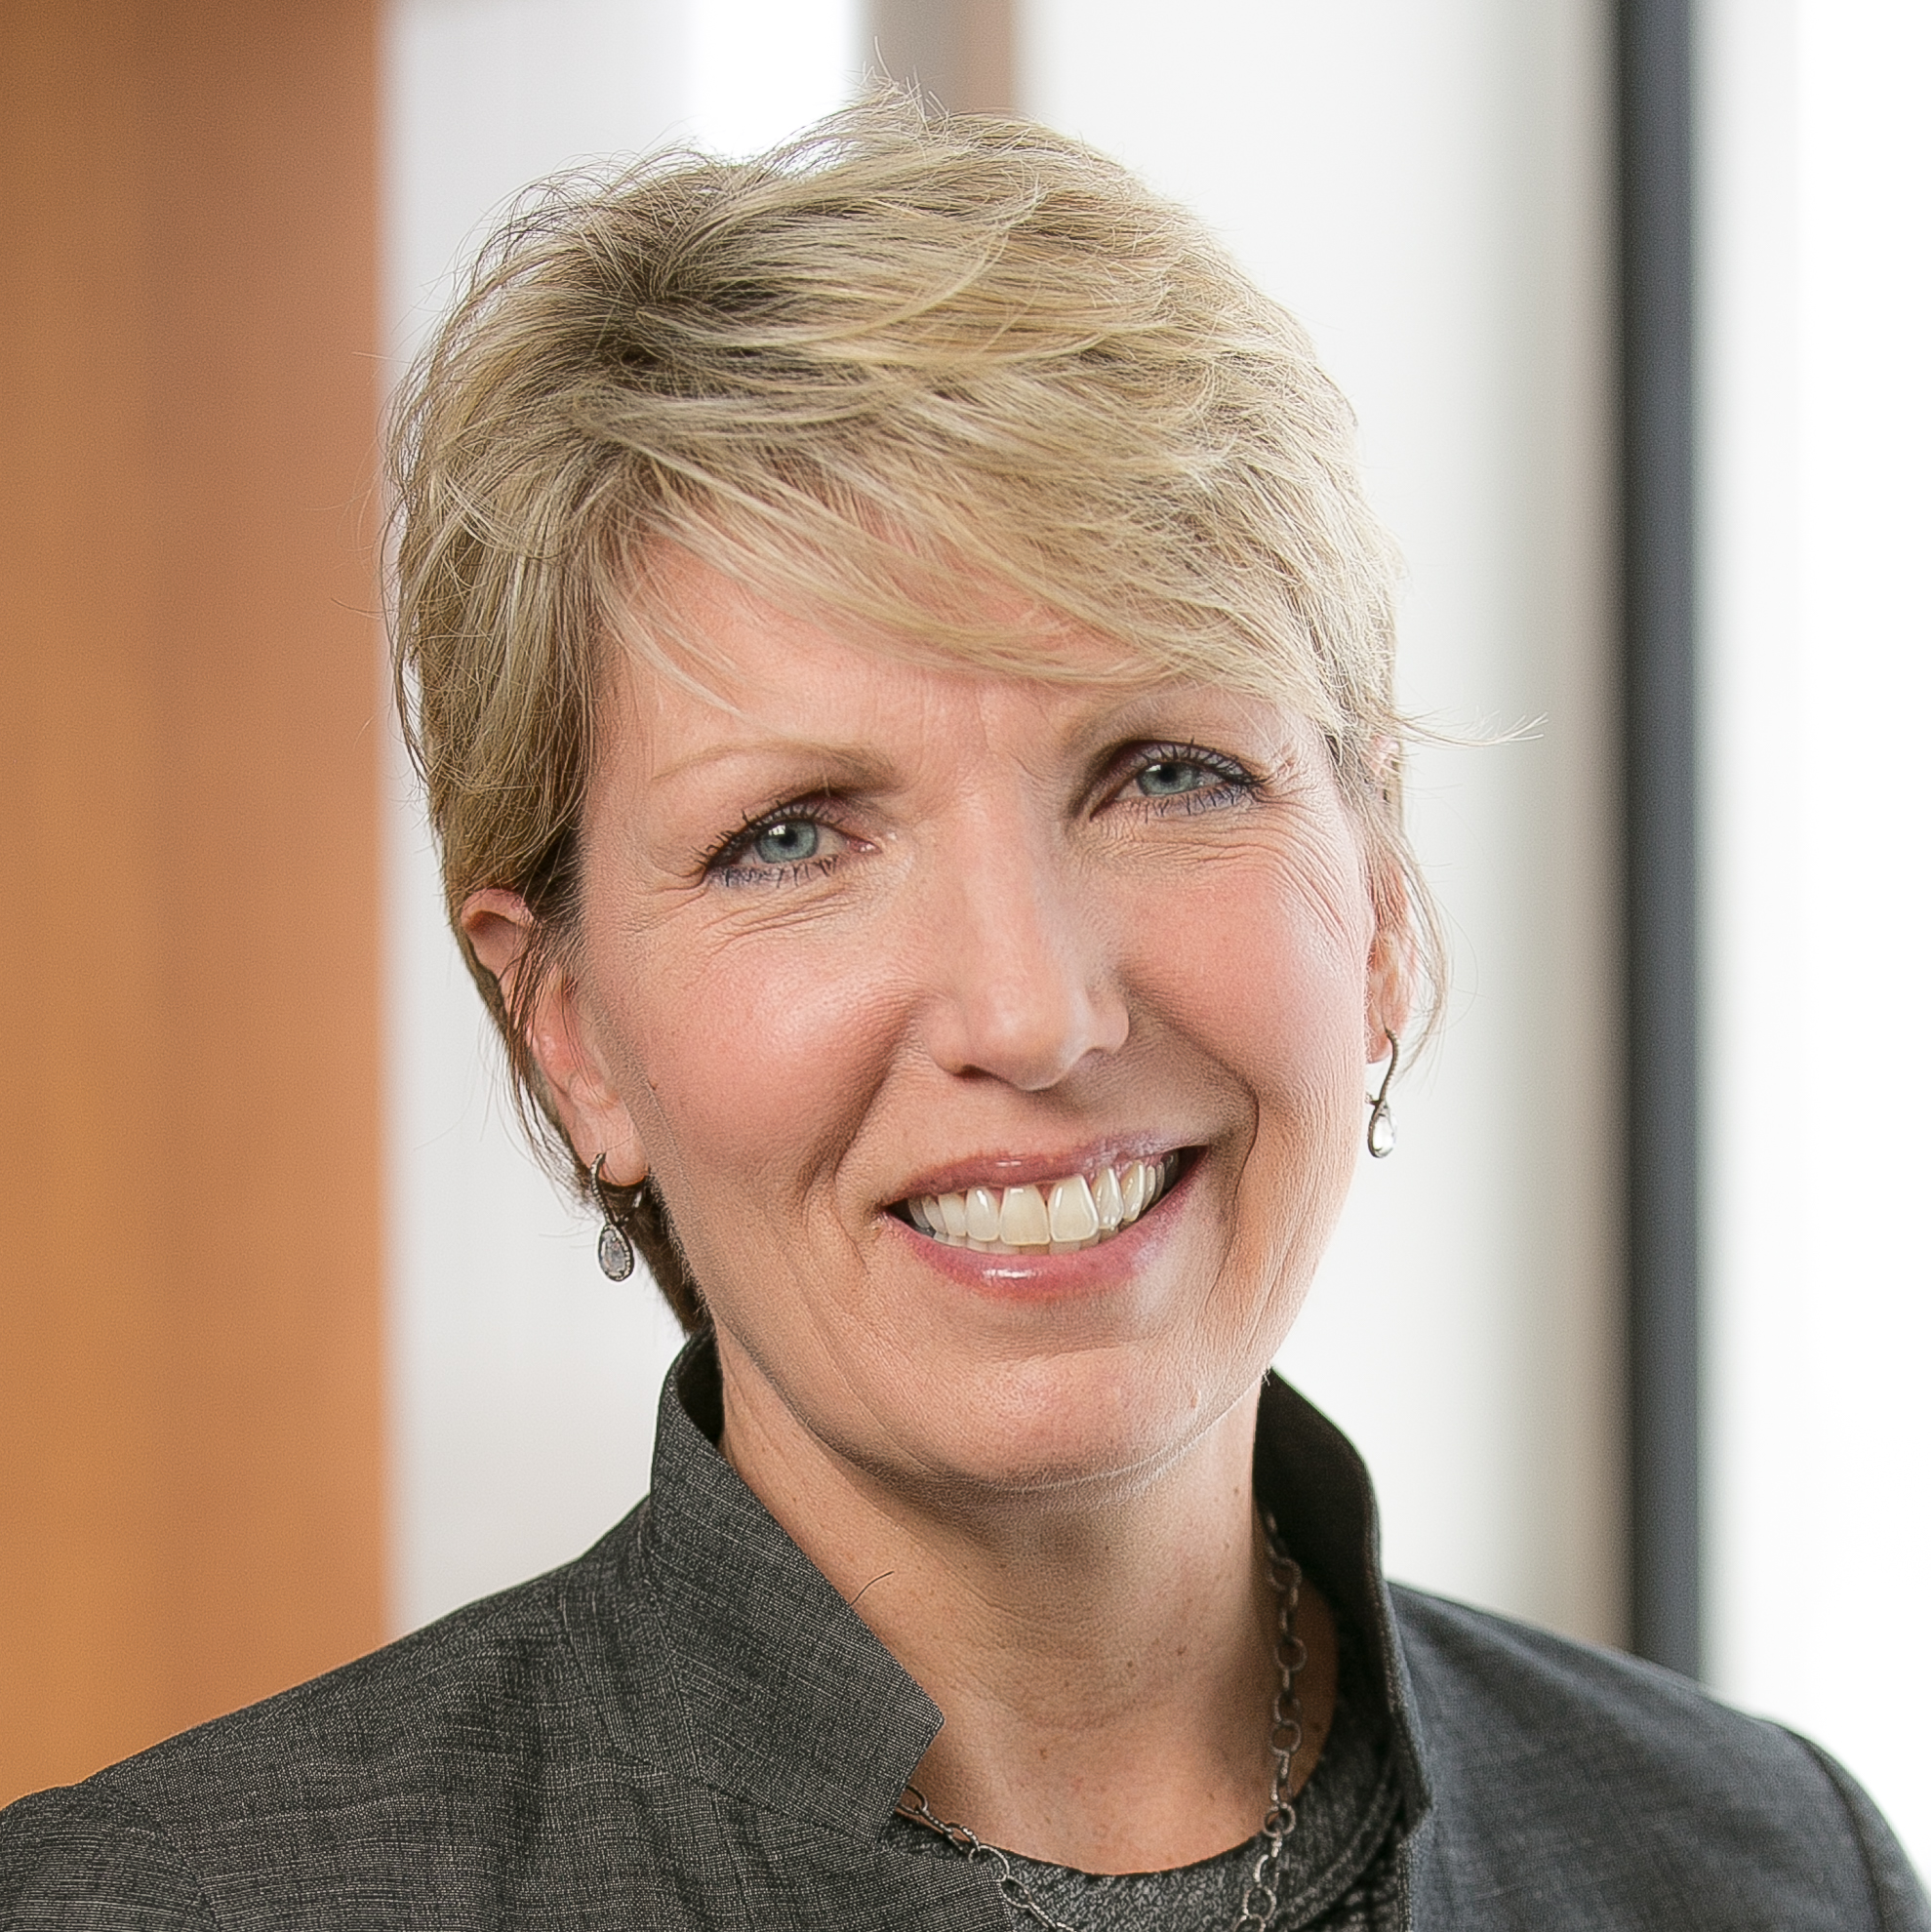 Carla Zuniga, Senior Vice President at Allstate Insurance Company